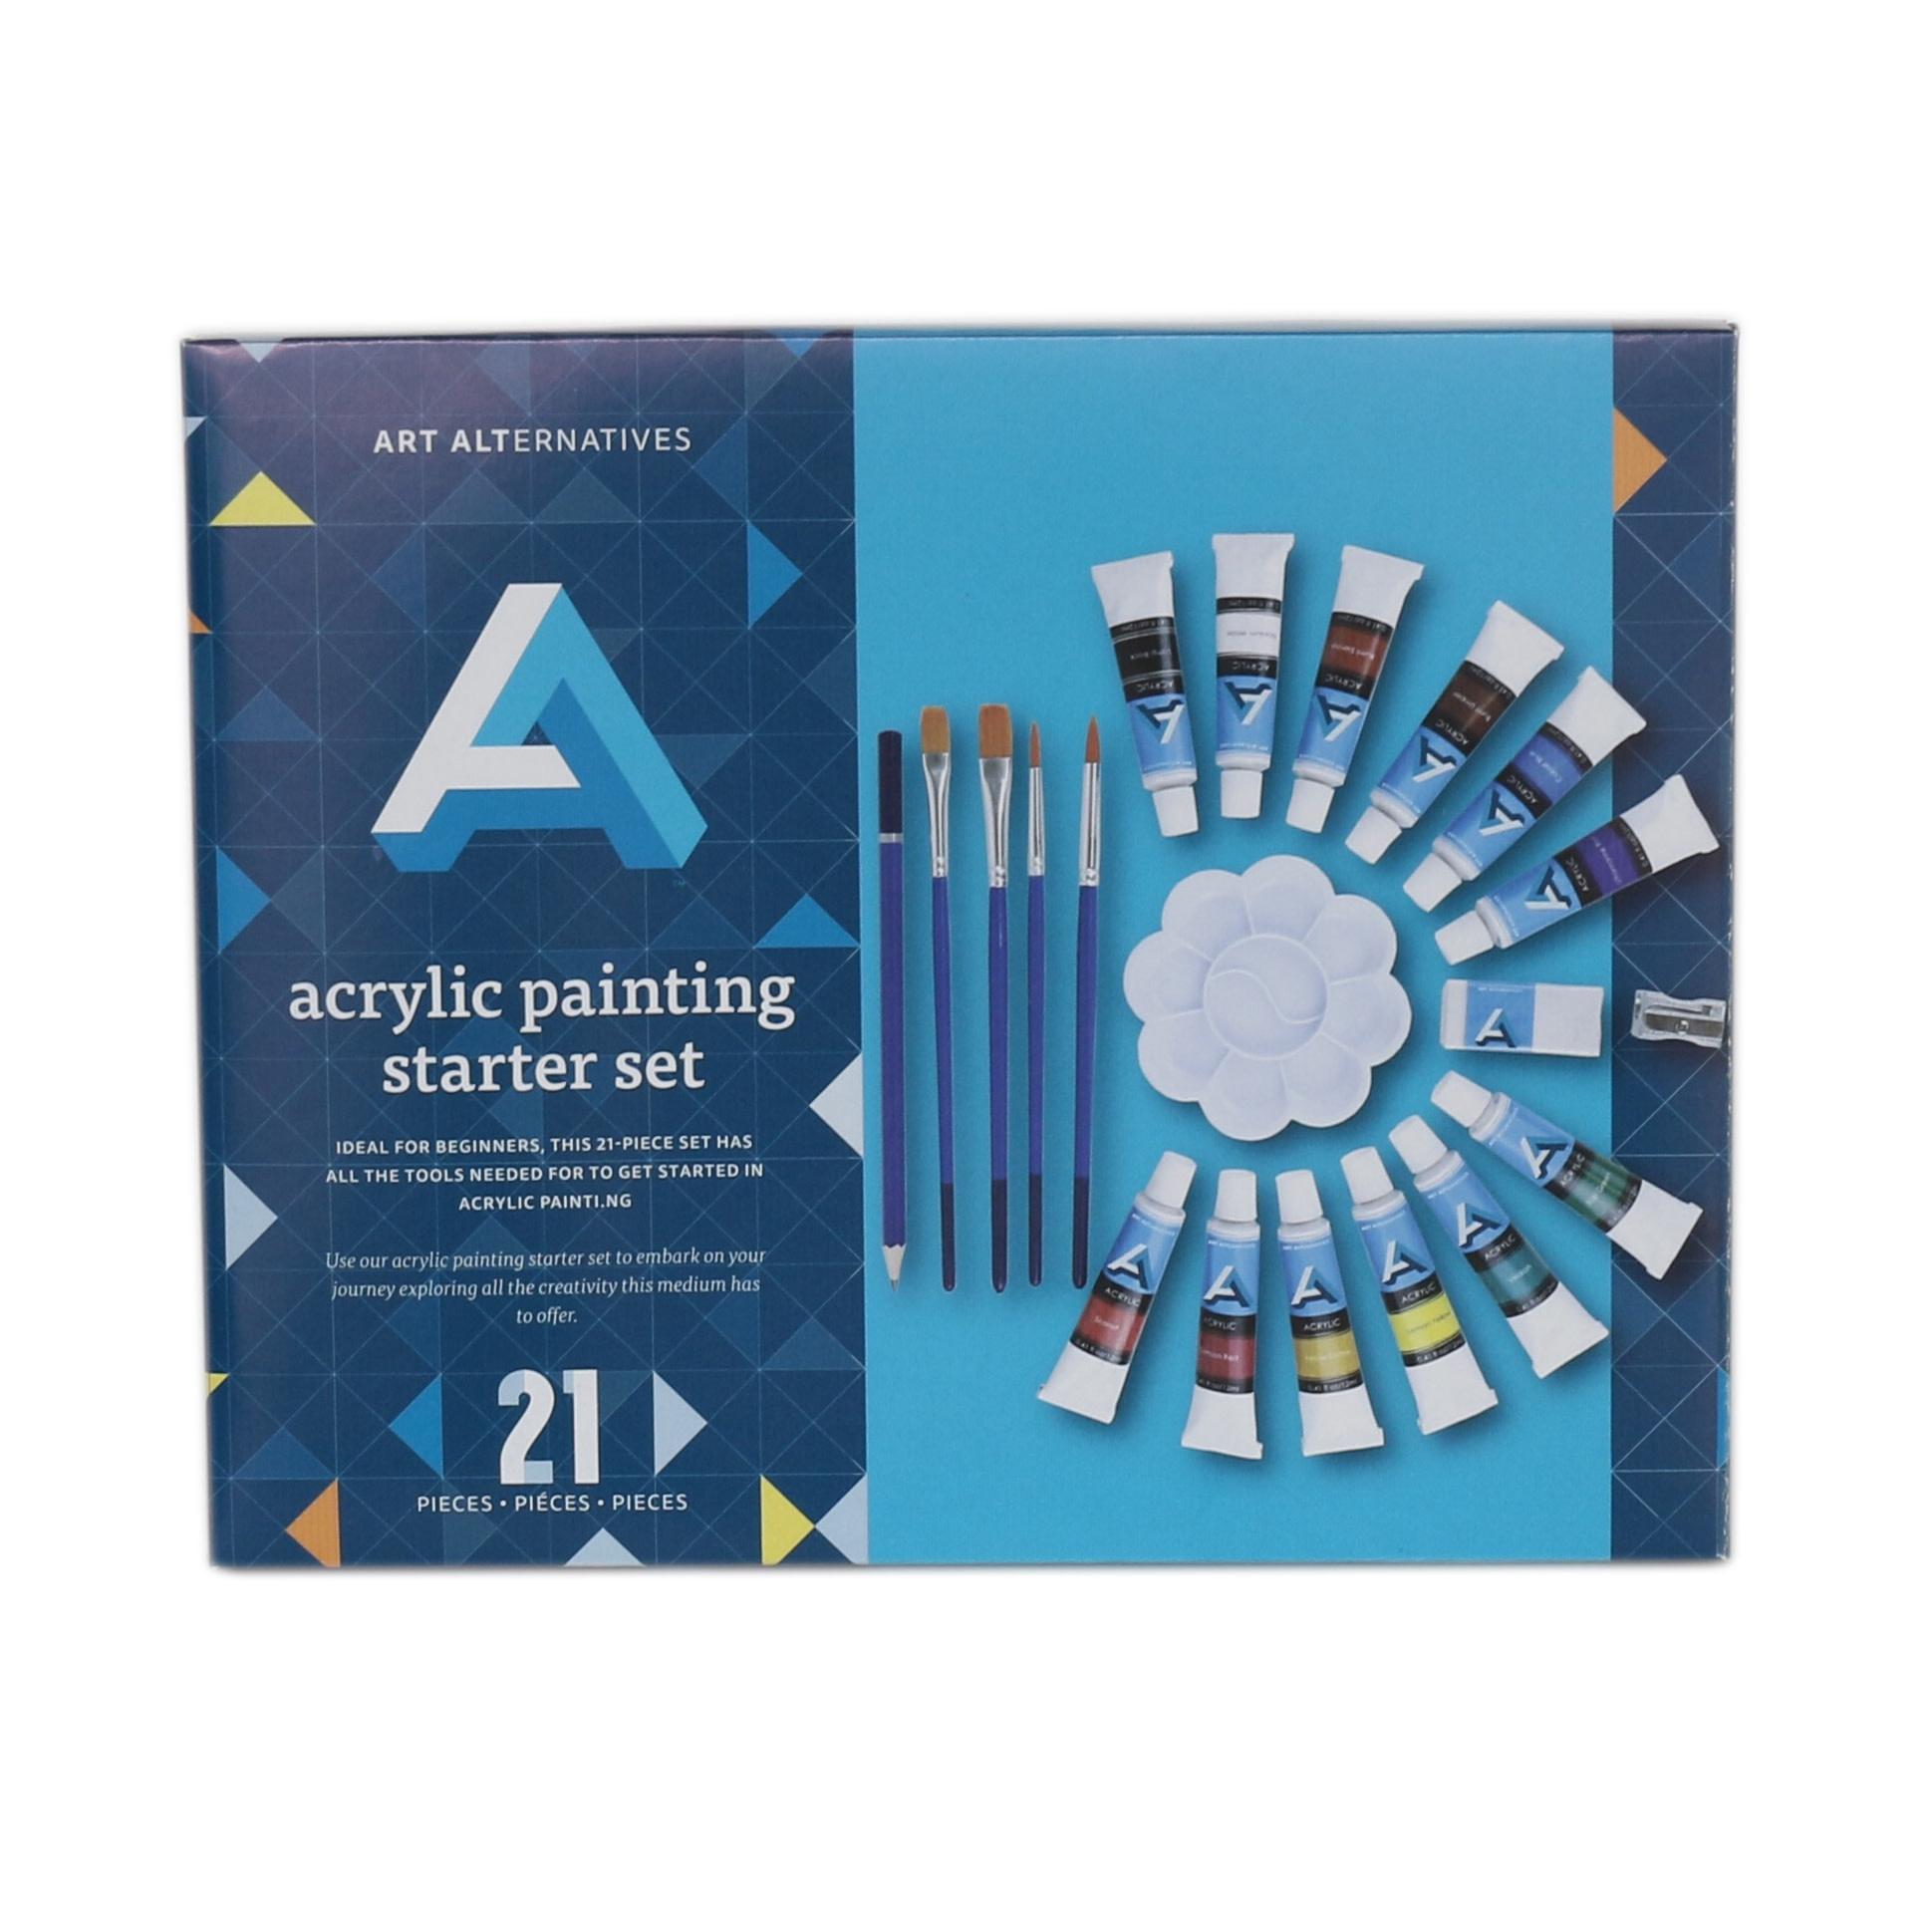 ART ALTERNATIVES ACRYLIC PAINTING STARTER SET 21/PC